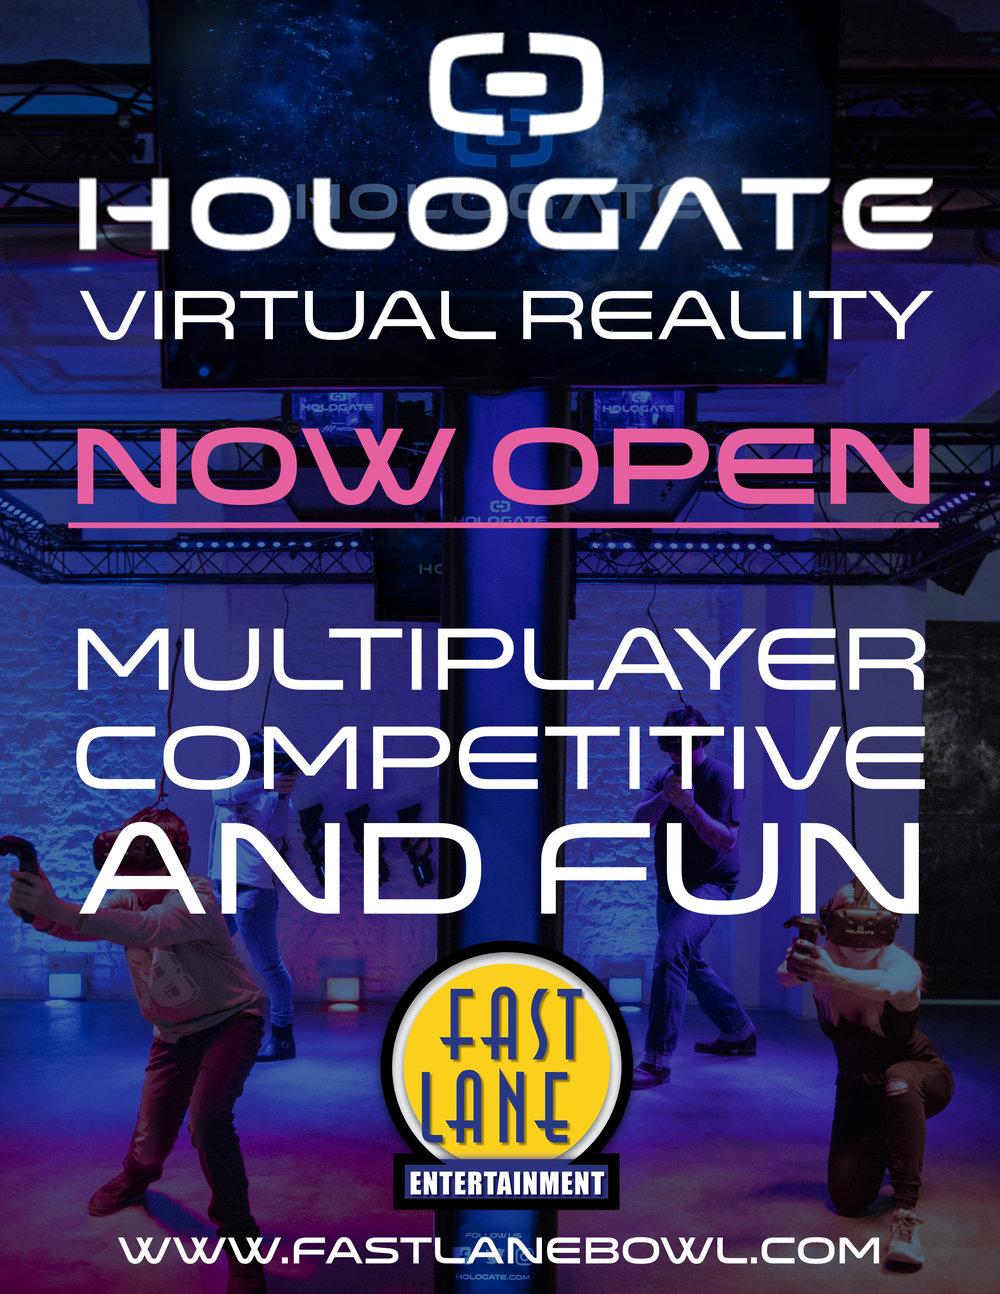 Hologate Now open Flyer.jpg